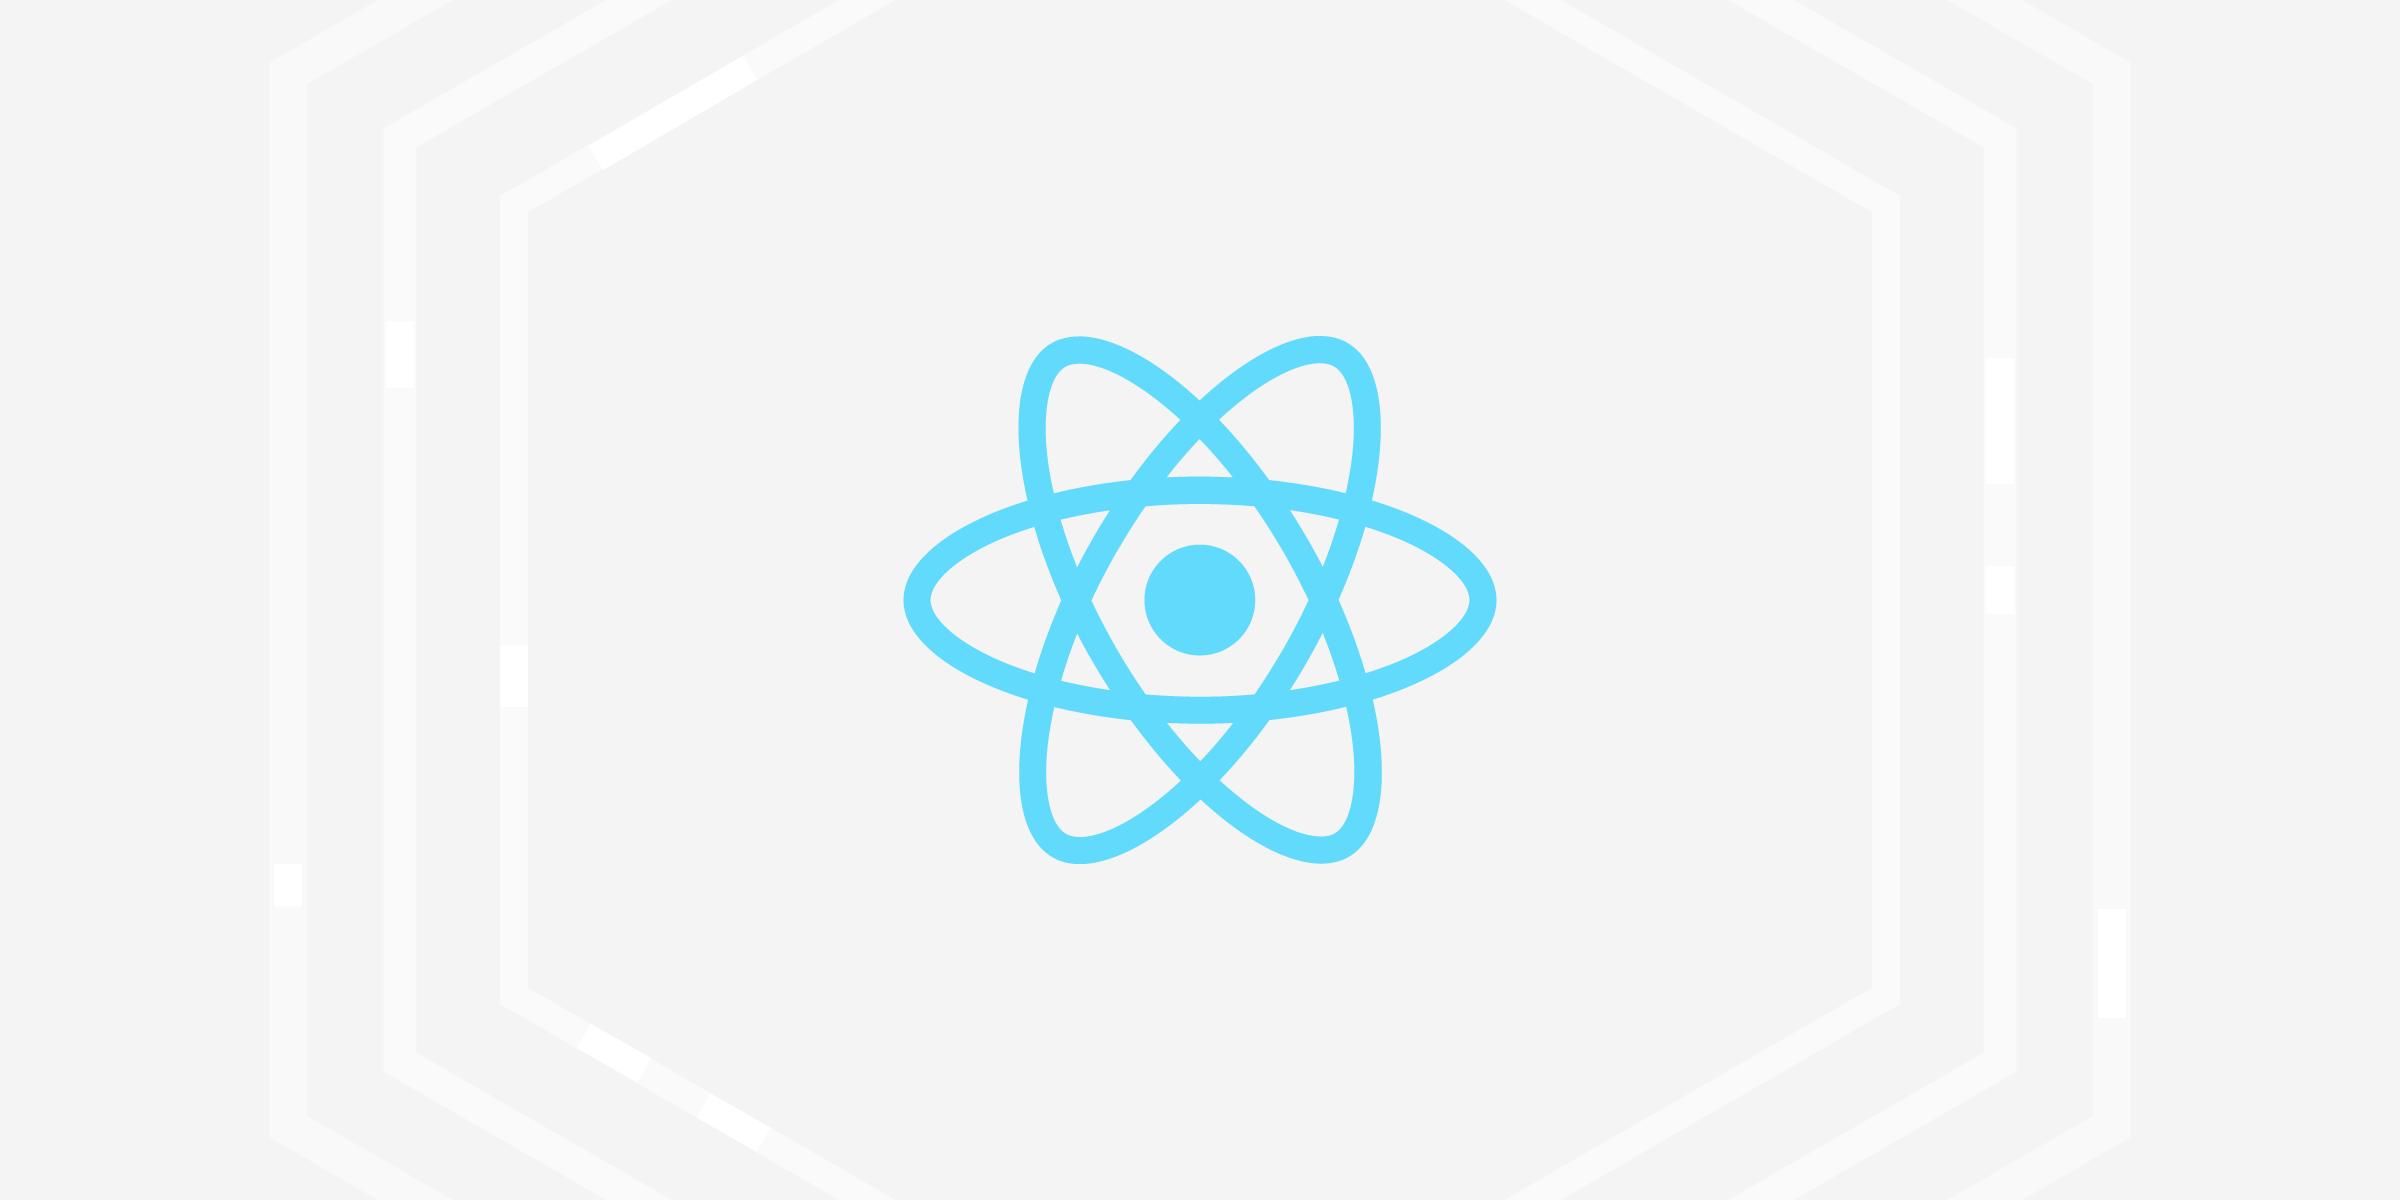 blog-react2x